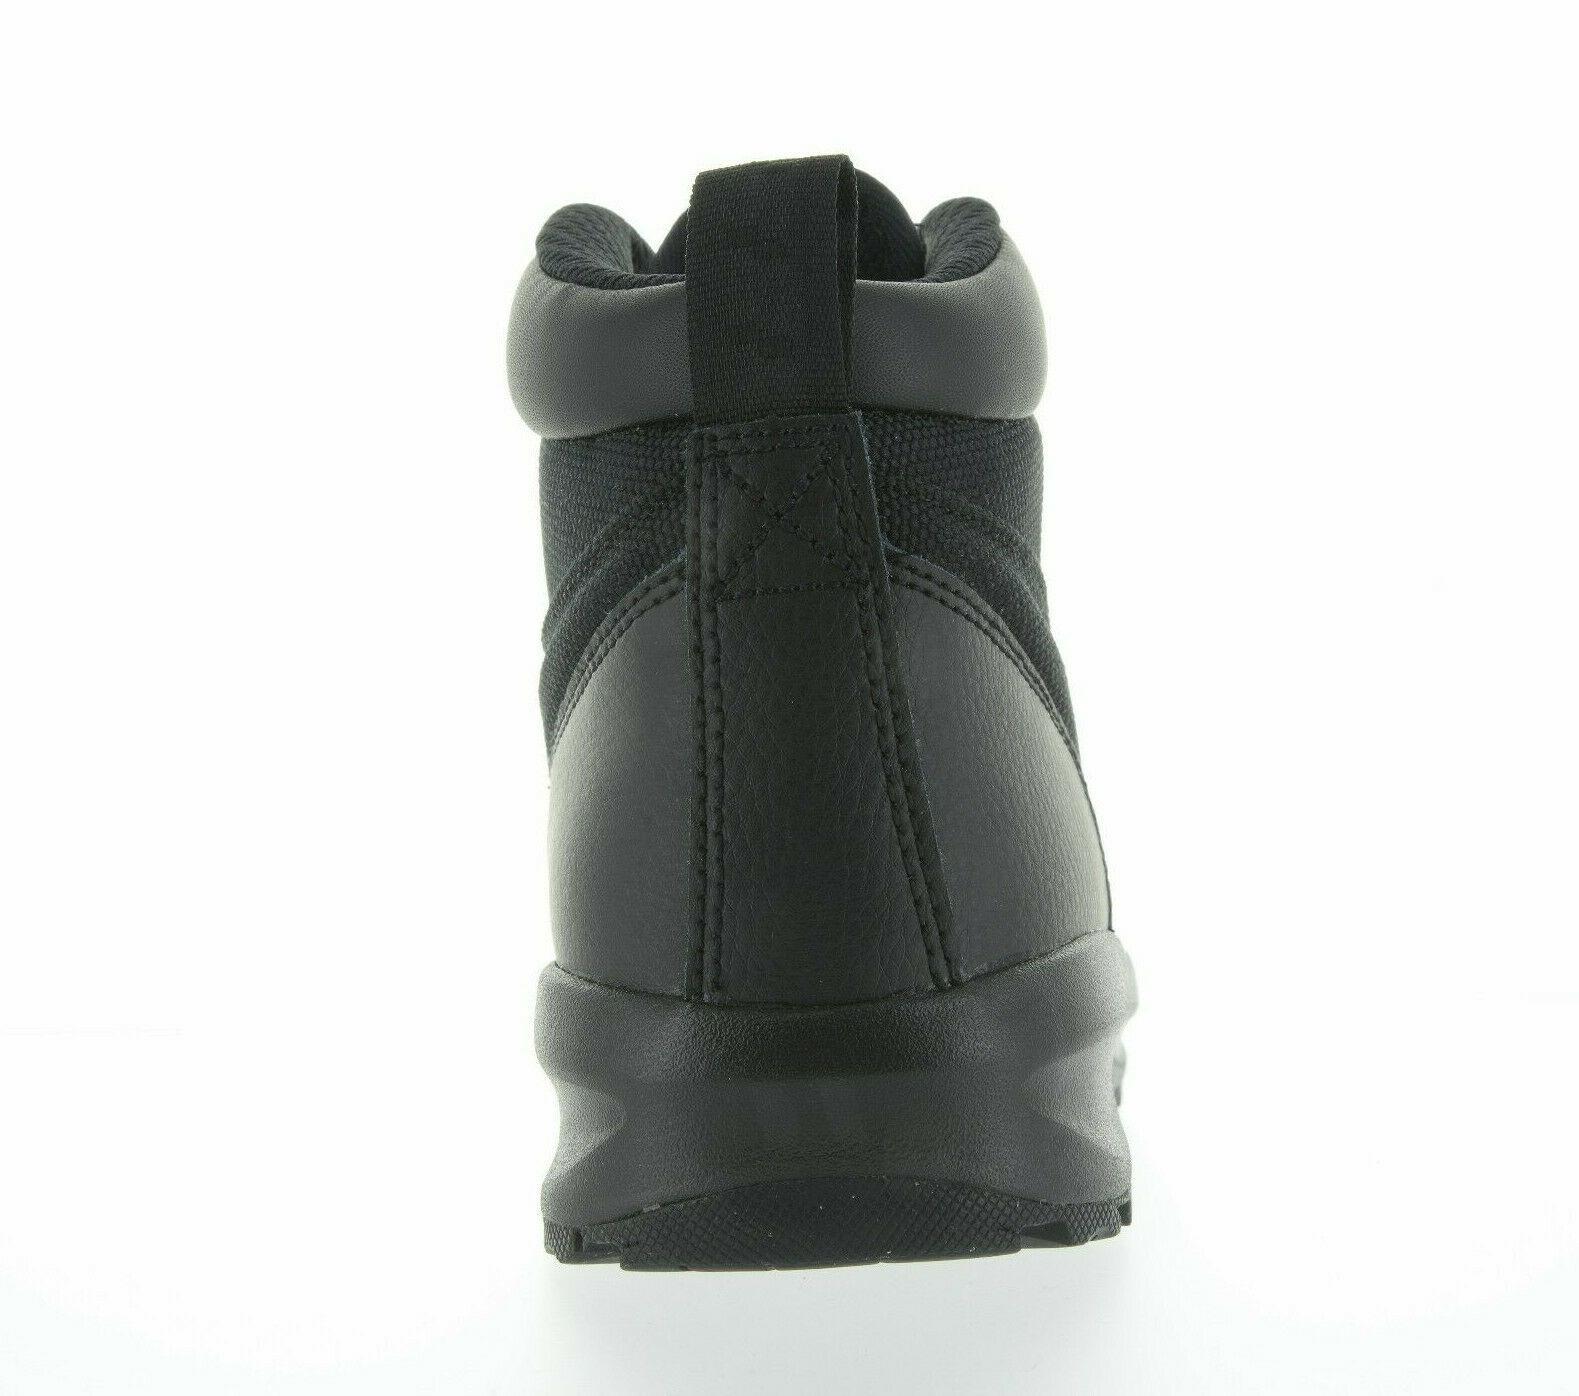 GS Nike Manoa Black//Black-Black AJ1280 001